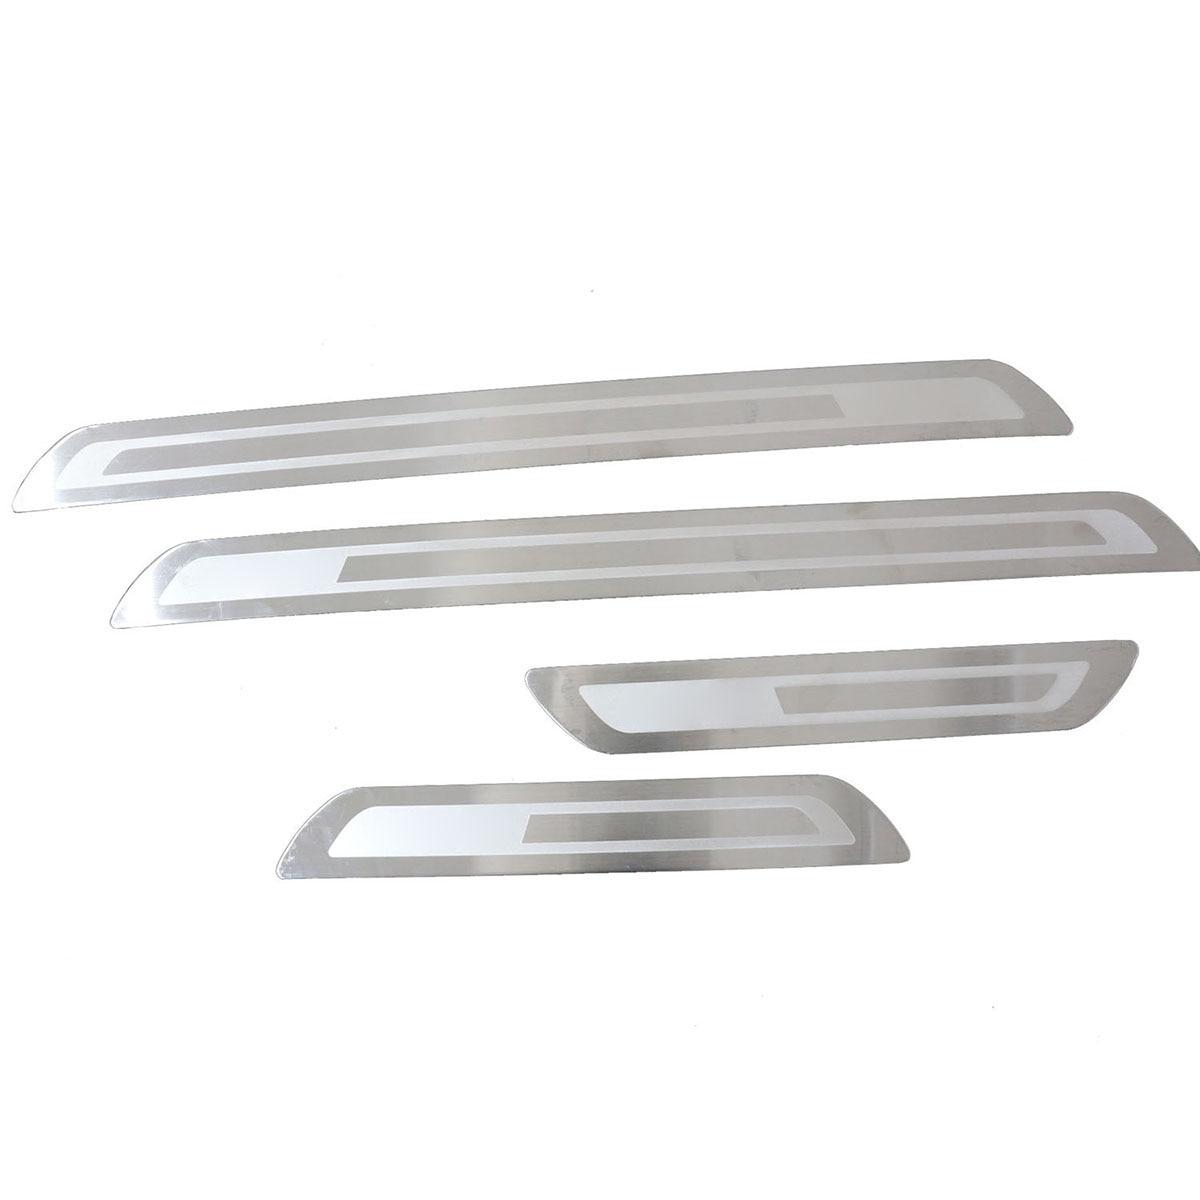 Chrome 4Pcs Door Scuff Plate Stainless Steel Trim Guard Sills for VW Golf MK6 sports car door sill scuff plate guard sills for 2014 mazda 6 atenza m6